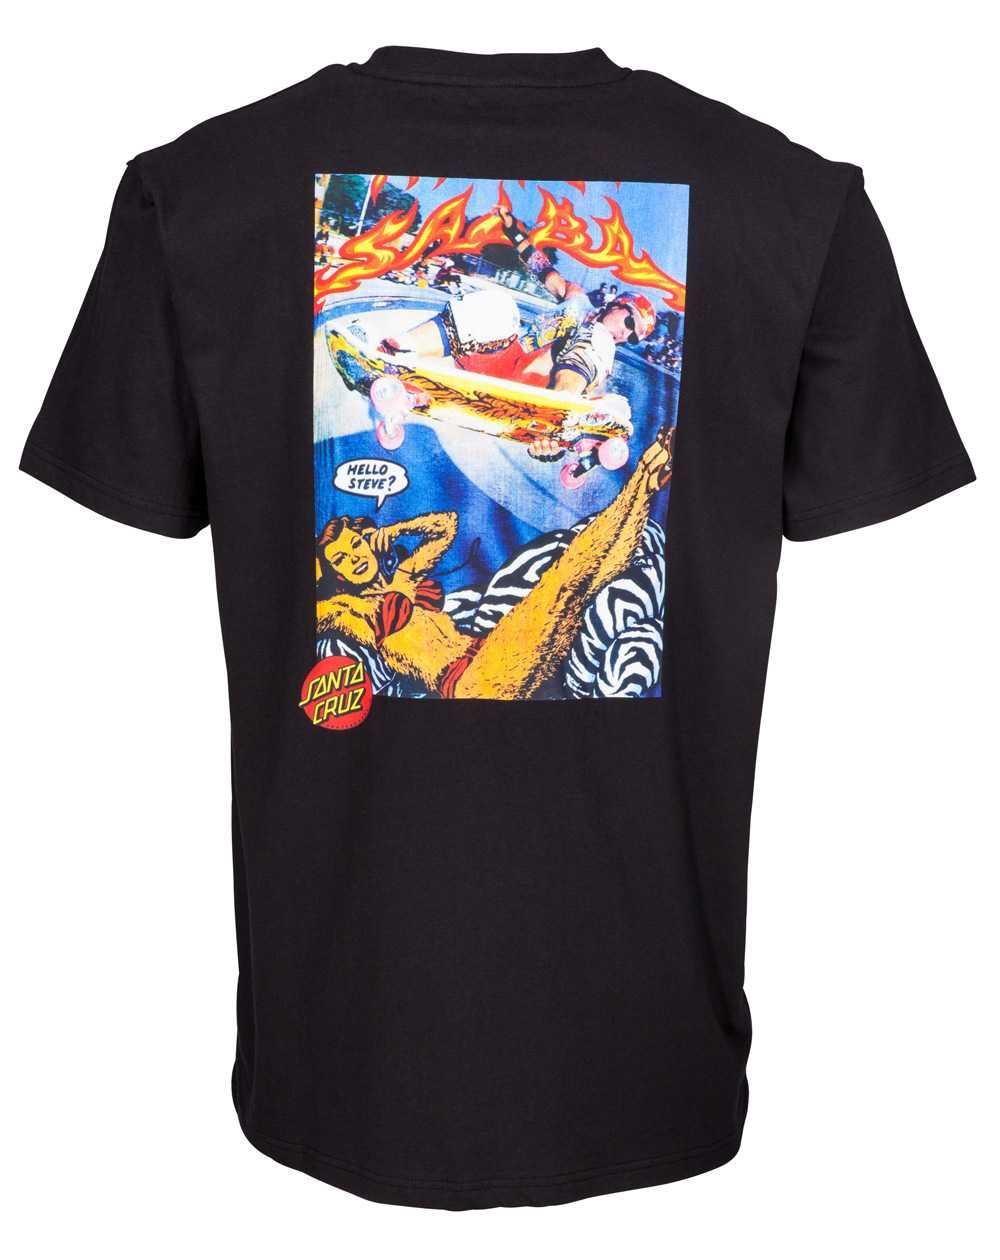 Santa Cruz Men's T-Shirt Hello Steve? Black